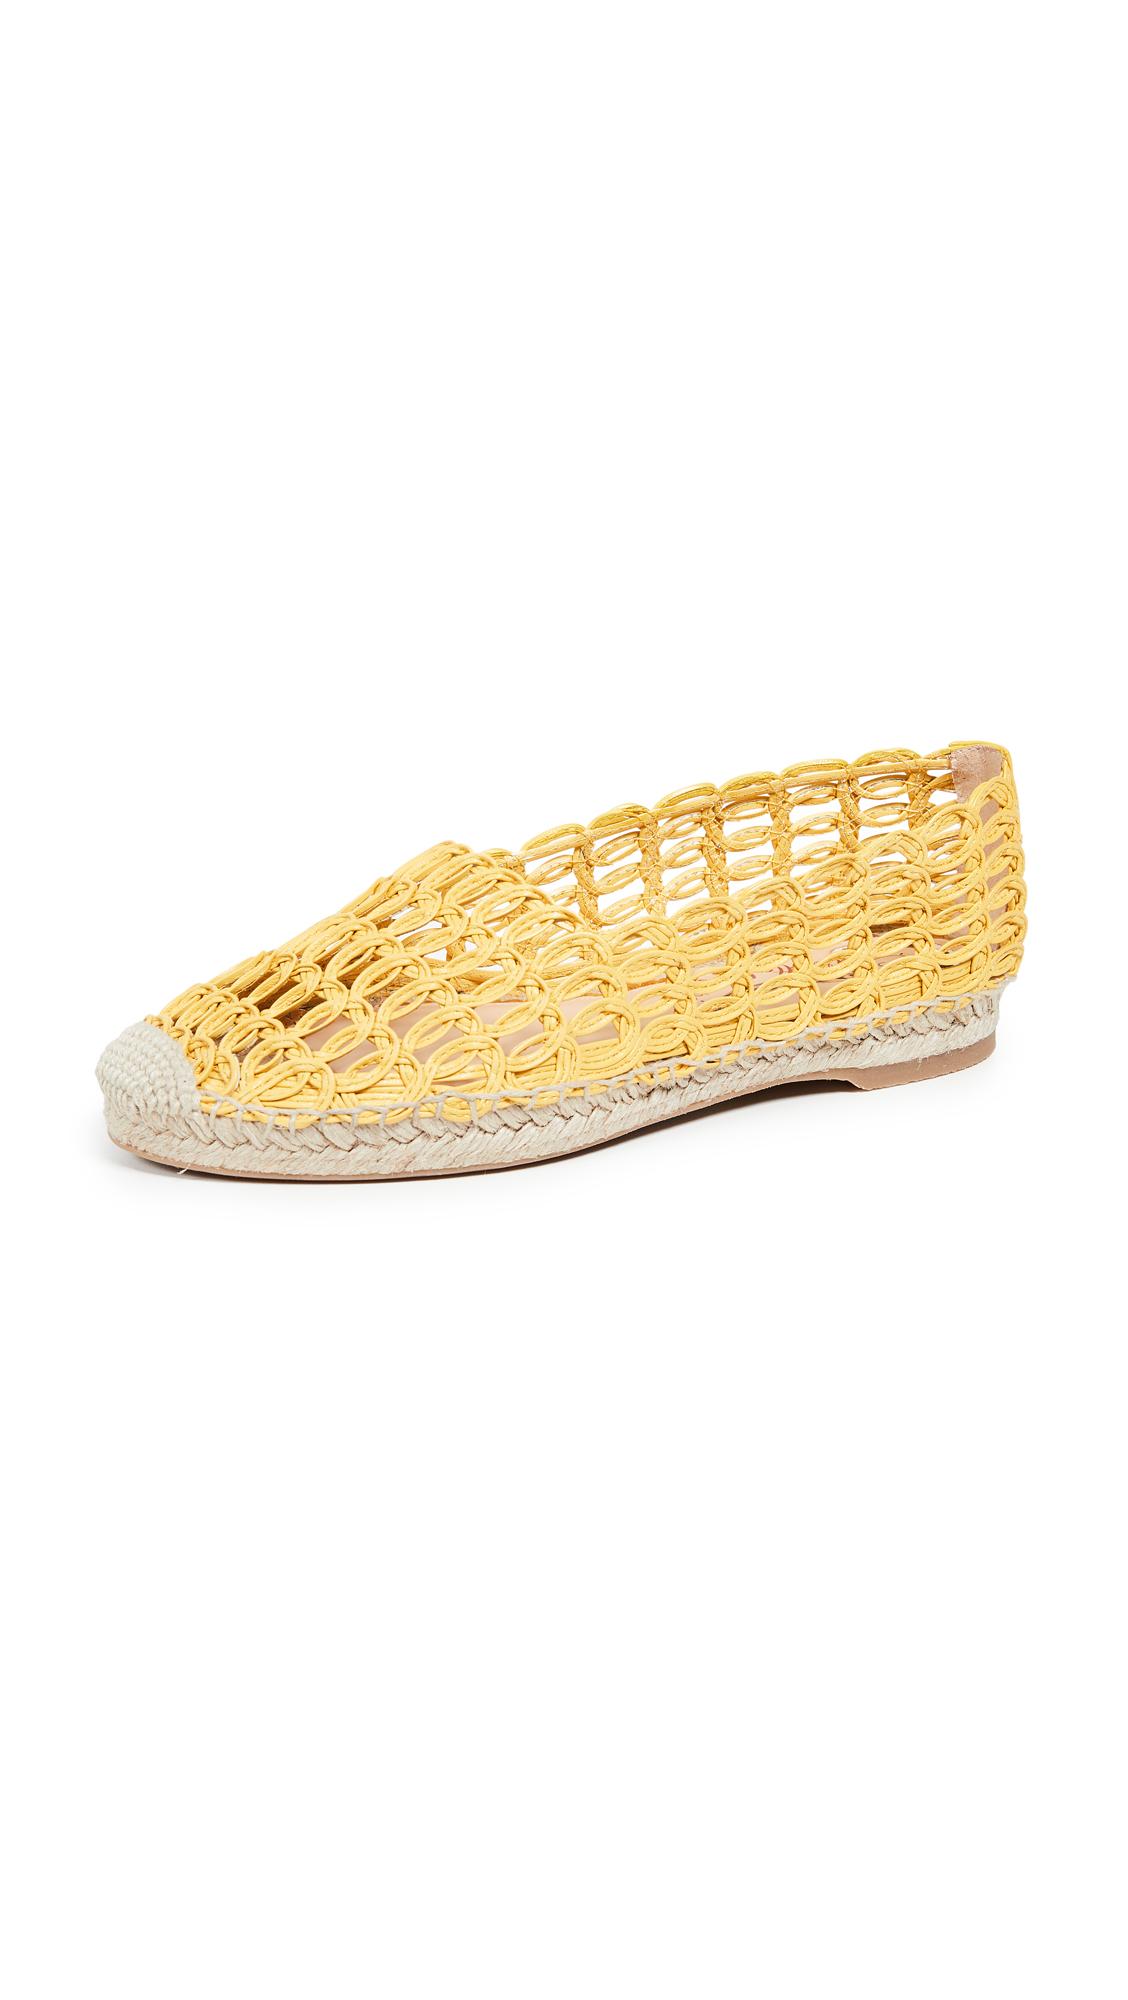 Charlotte Olympia Woven Espadrilles - Sunshine Yellow